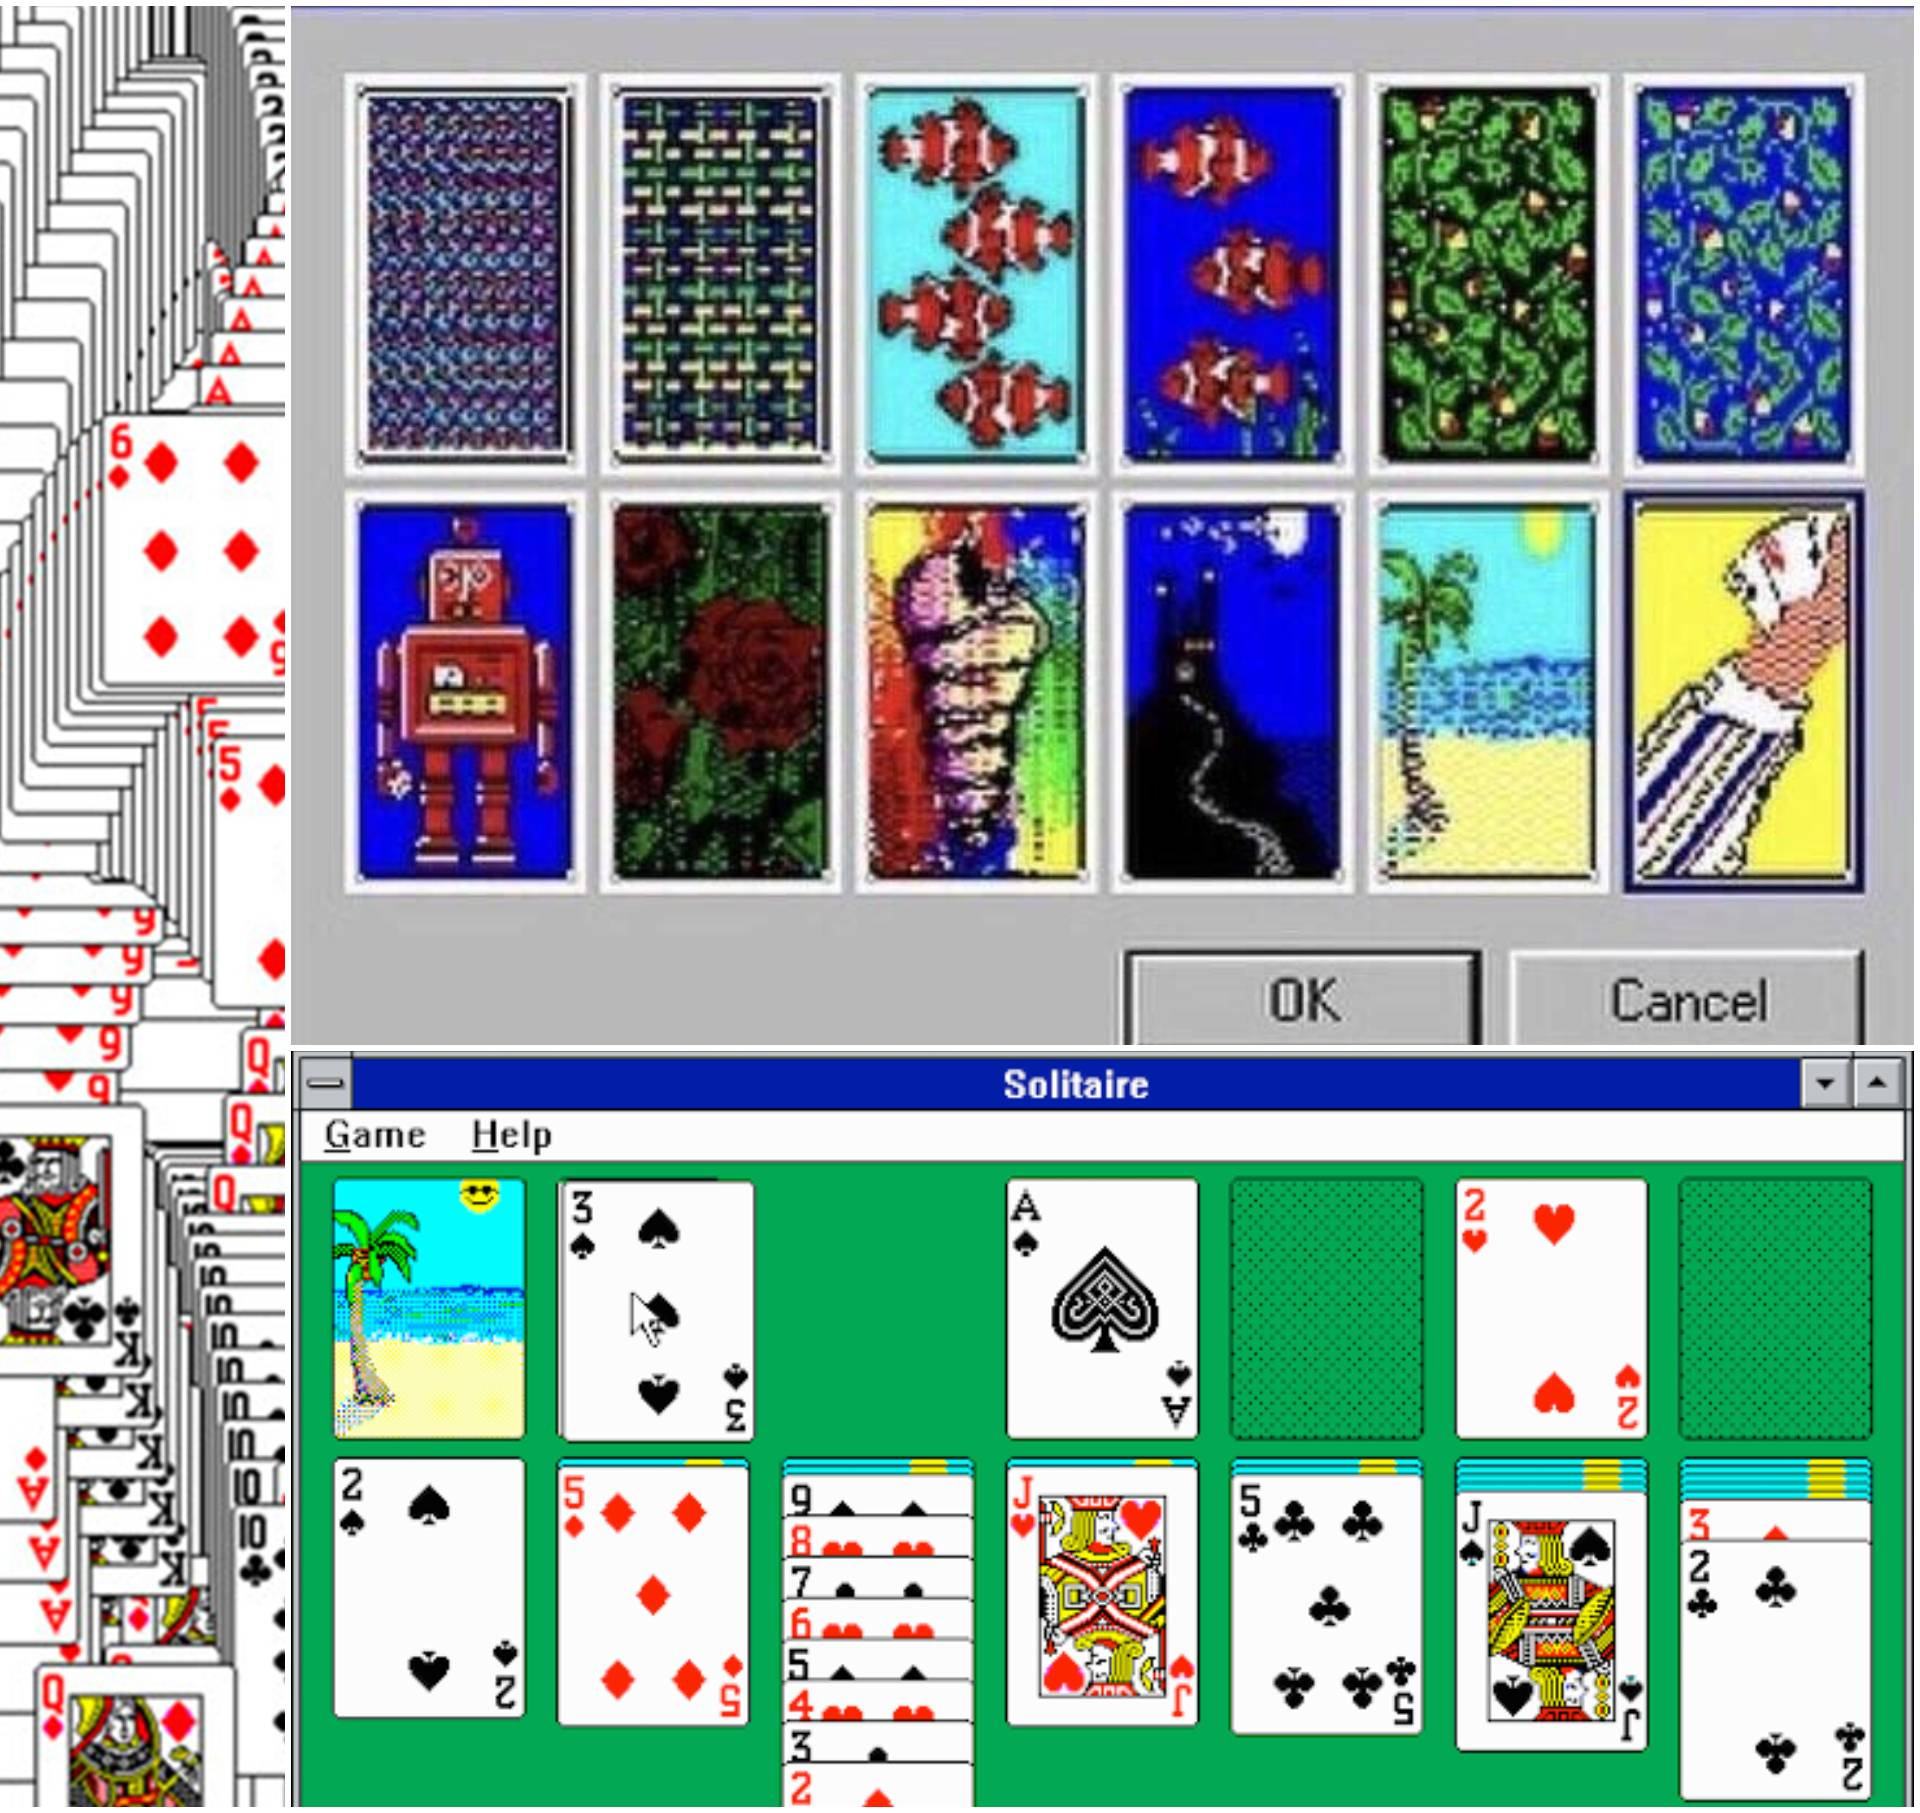 Odigrajte jedan Solitaire za 30. rođendan legendarne video igre